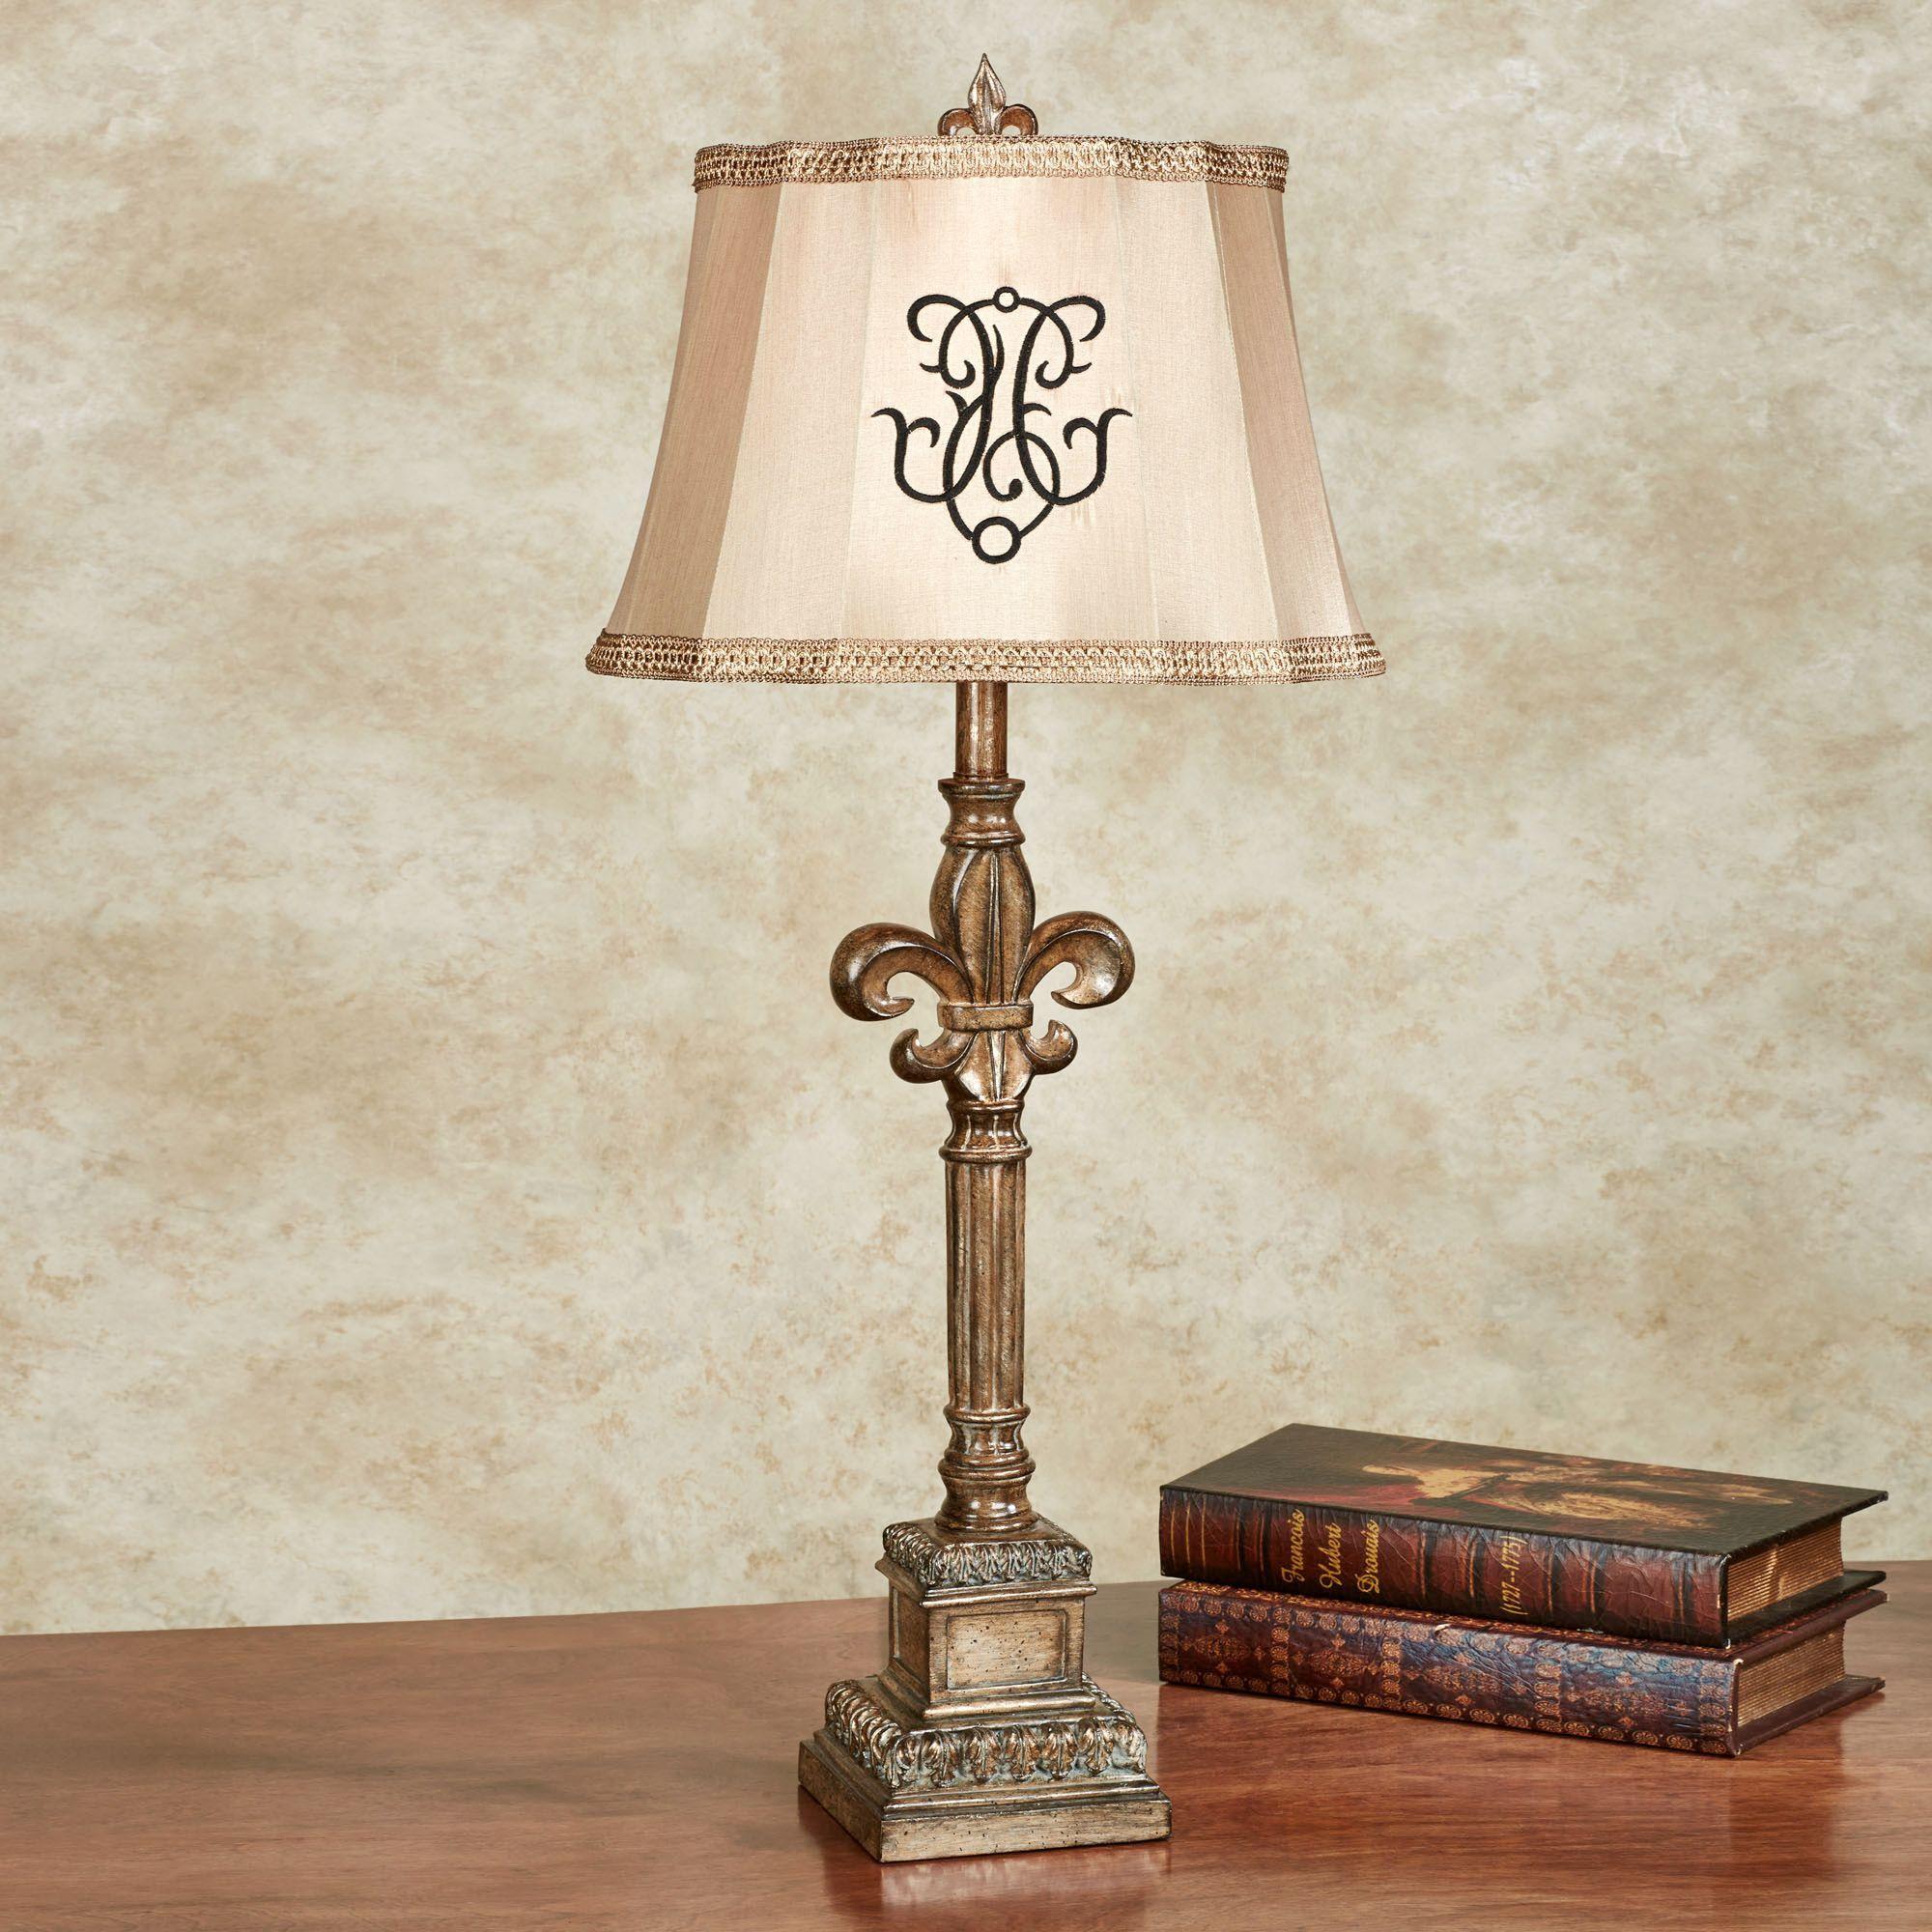 Leena fleur de lis table lamp a future home fleur de lis leena fleur de lis table lamp geotapseo Gallery